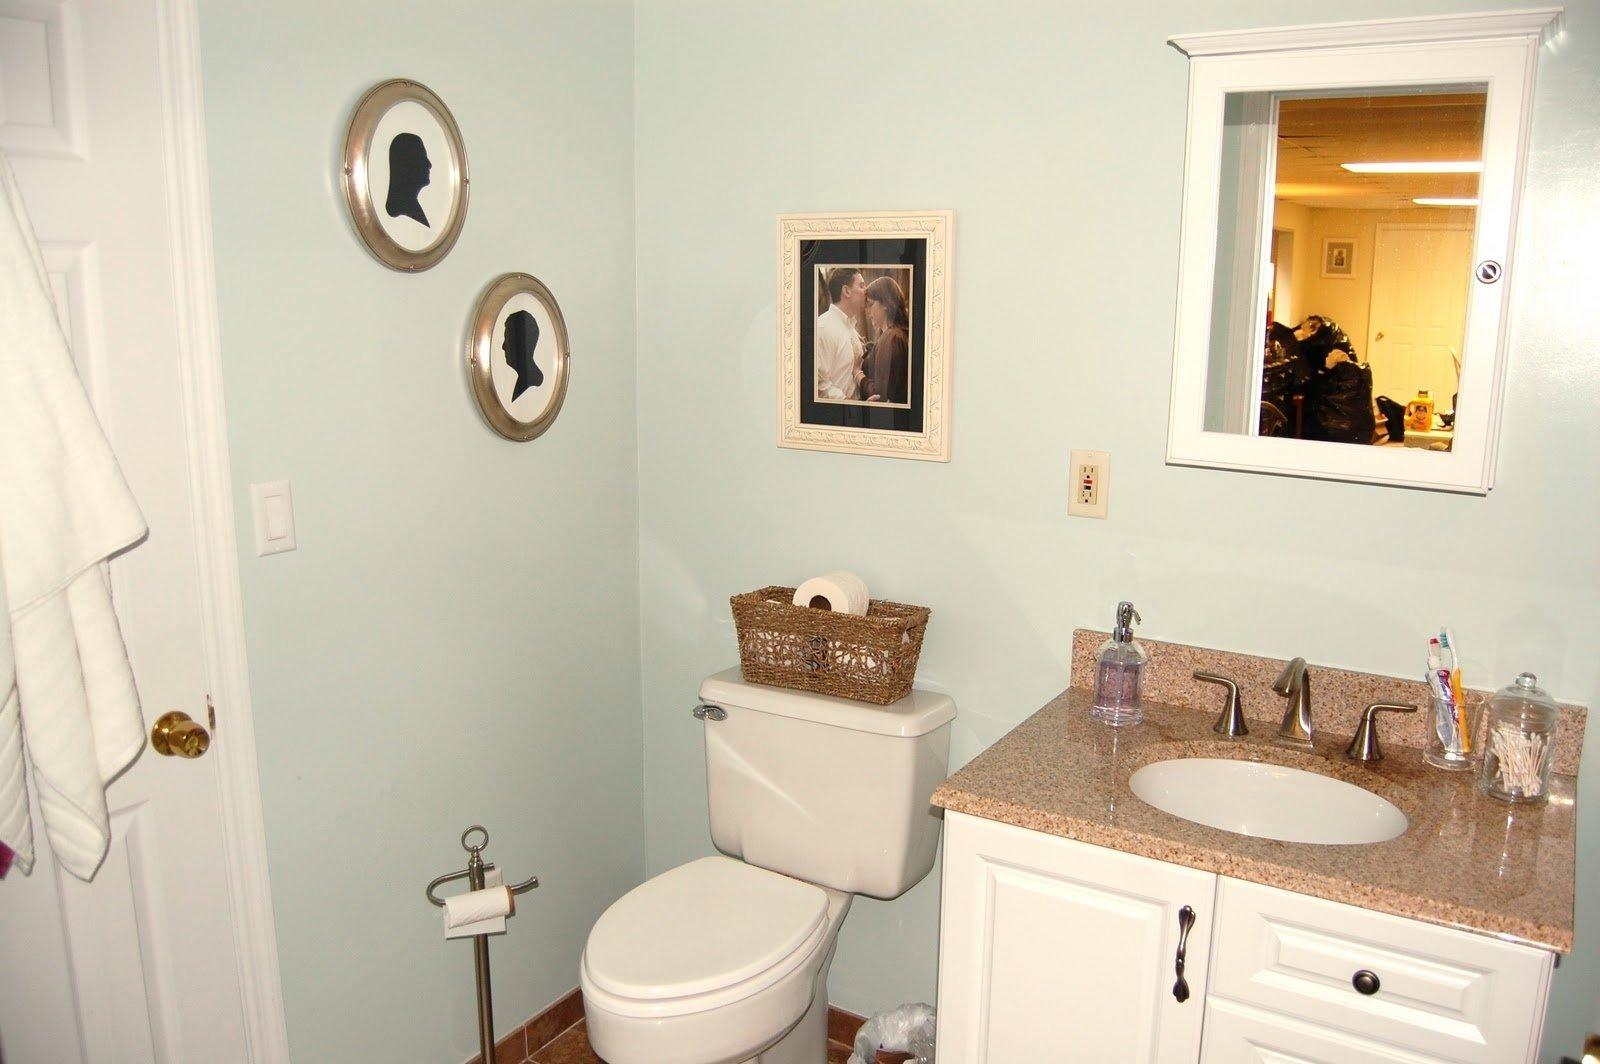 10 Famous Small Apartment Bathroom Decorating Ideas round white ceramic vessel single sink small apartment bathroom 1